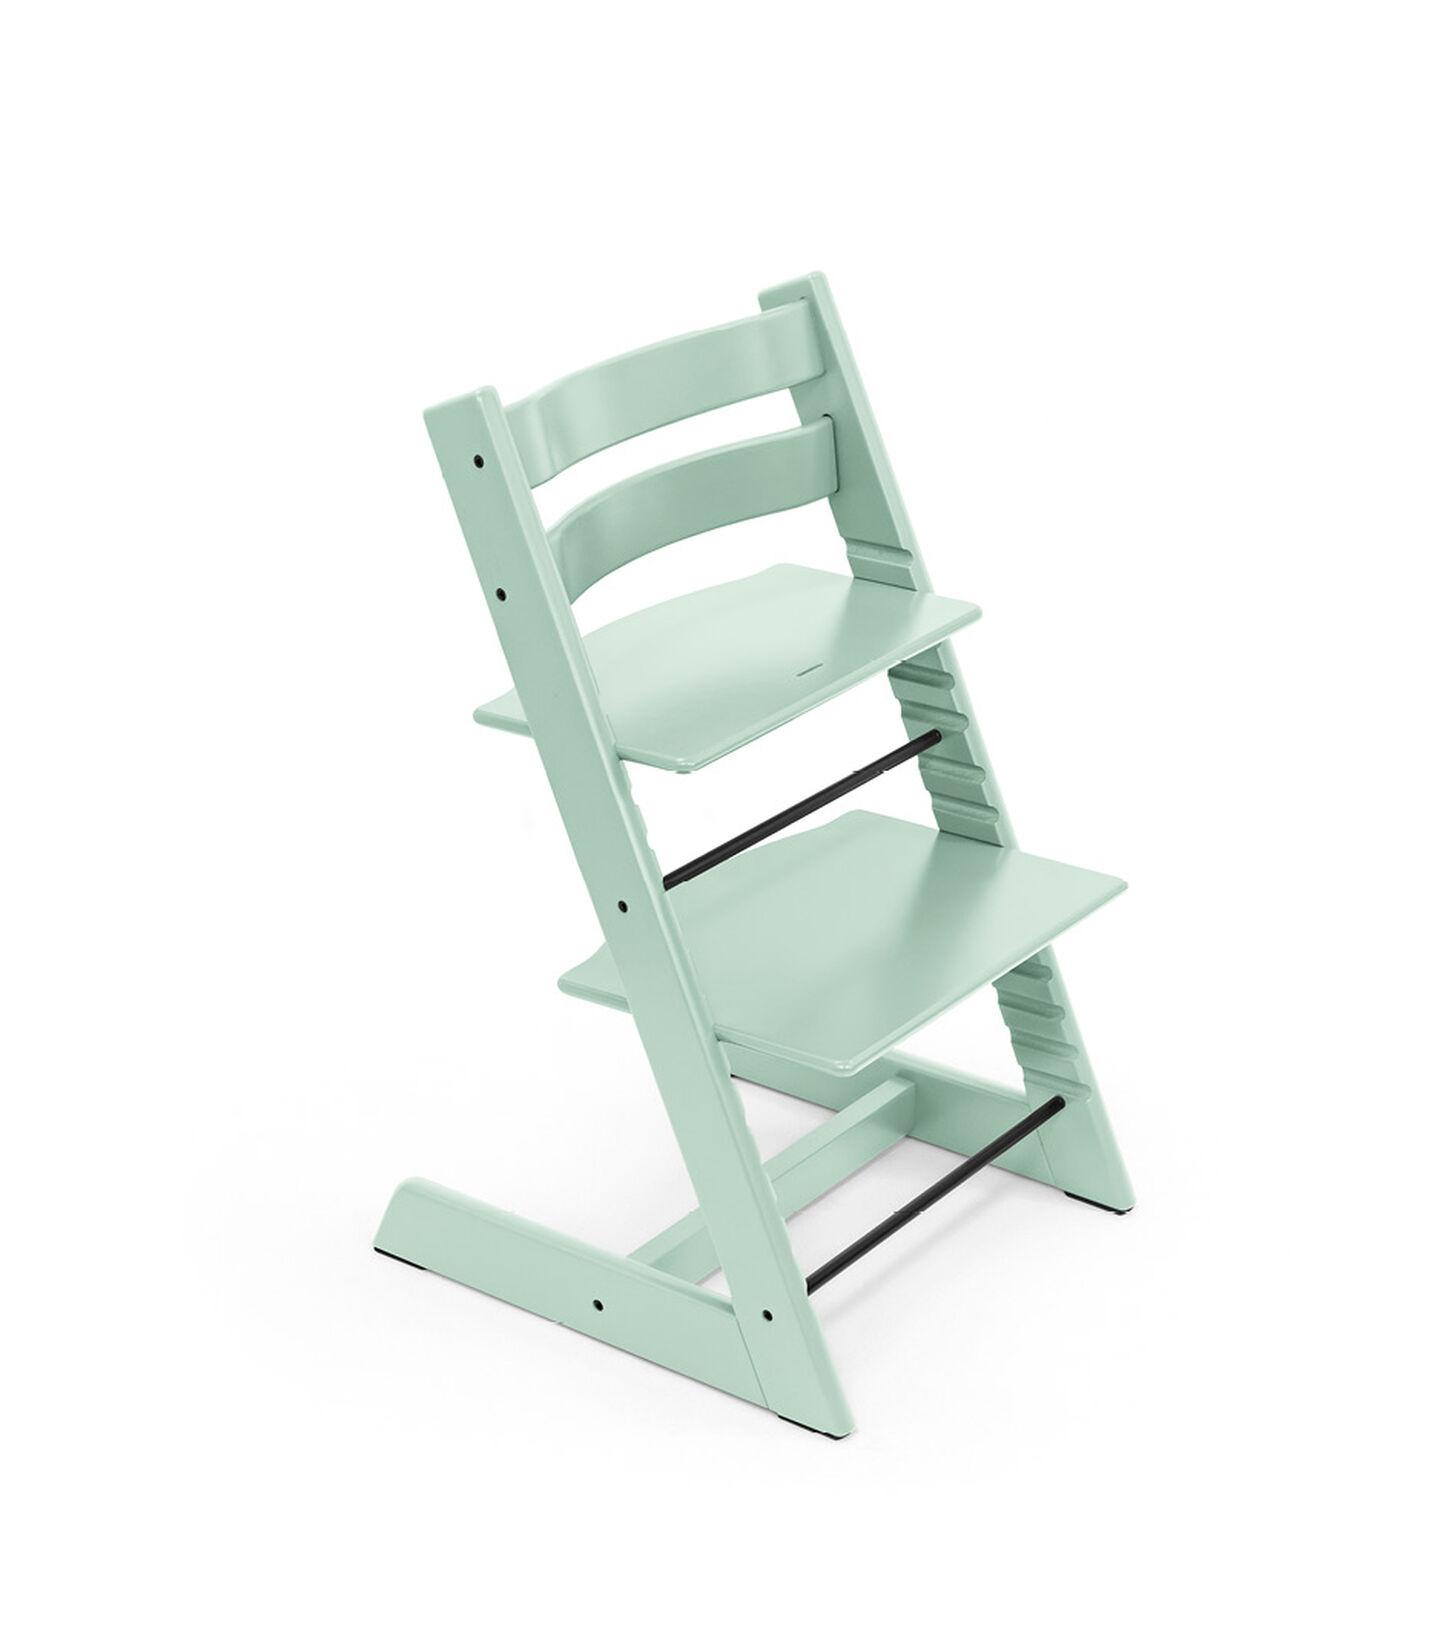 Tripp Trapp® stoel Zacht mint, Zacht mint, mainview view 1